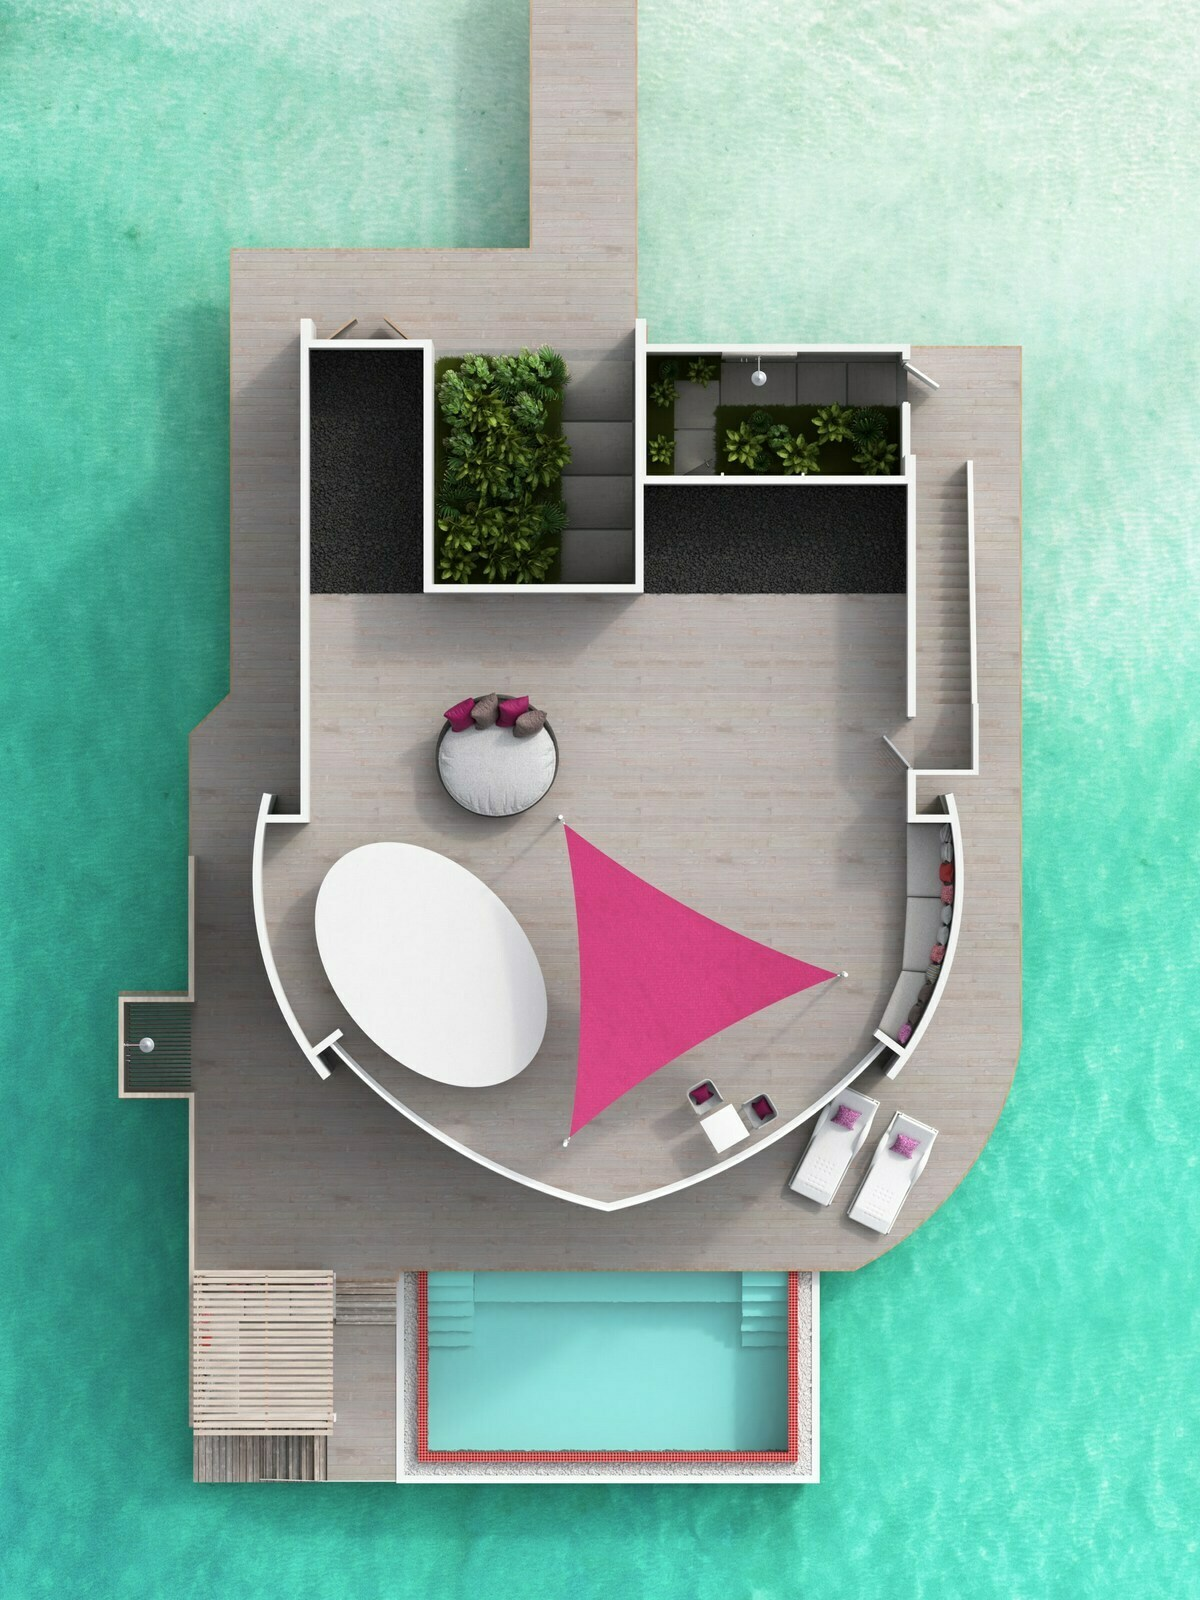 Мальдивы, отель LUX North Male Atoll, план-схема номера Prestige Water Villa with Pool